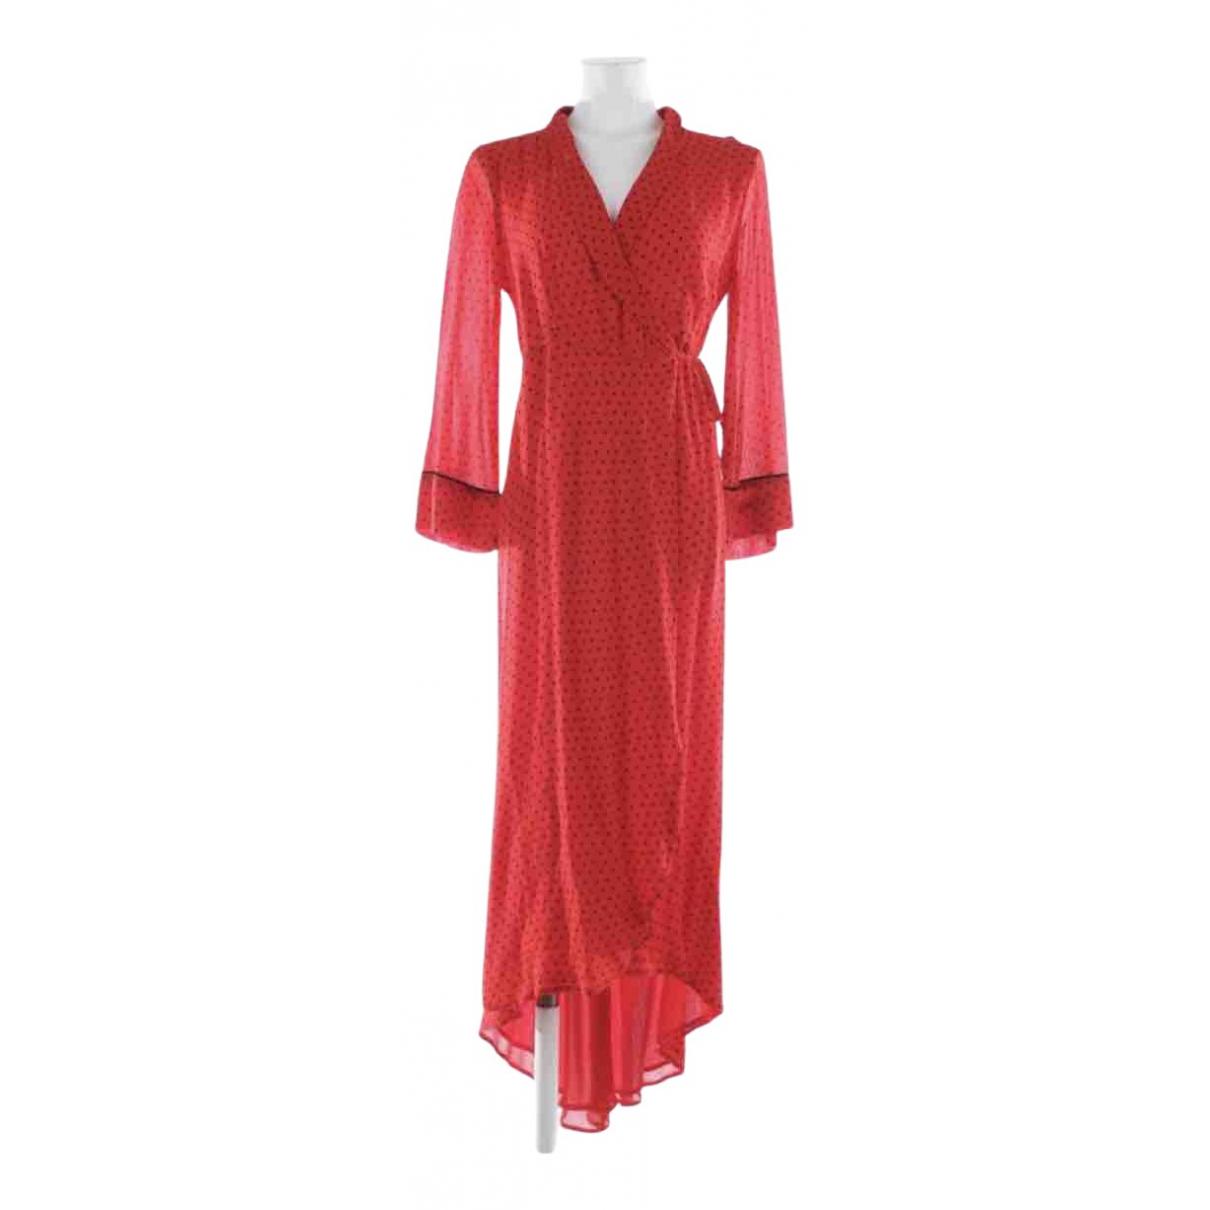 Ganni \N Red dress for Women 36 FR